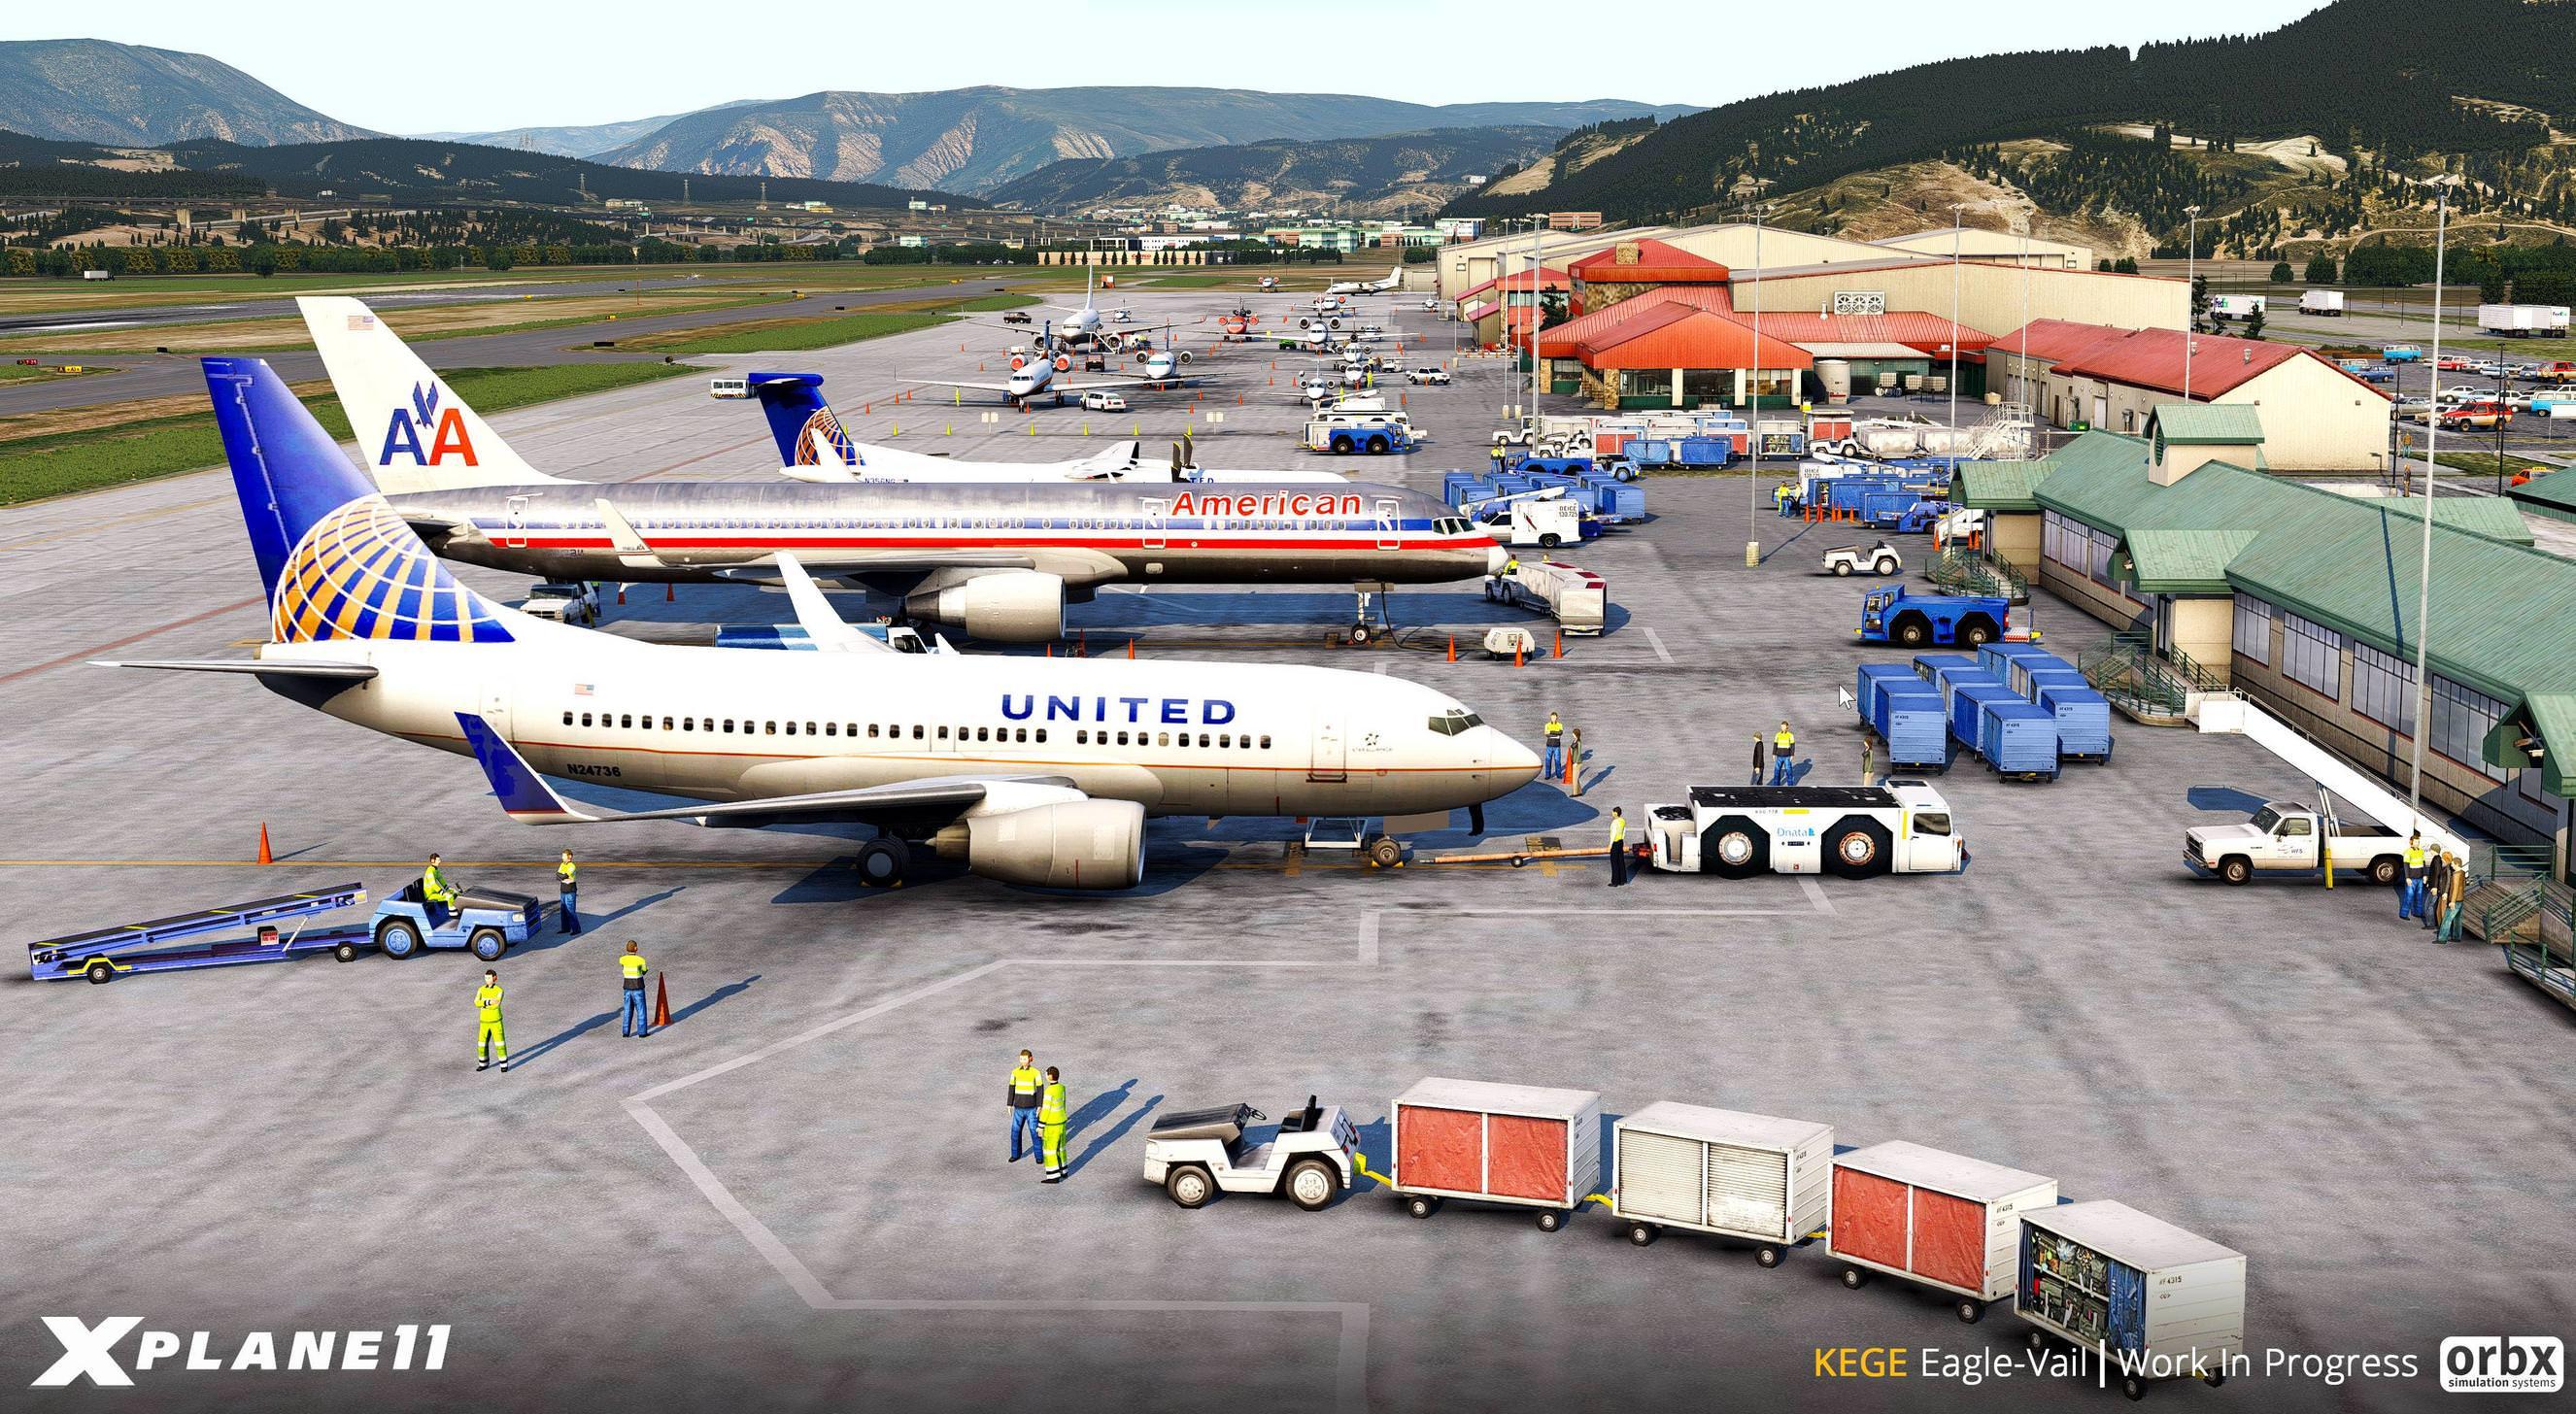 Orbx 2019: FTX Global comes to X-Plane, LOWI & KEGE